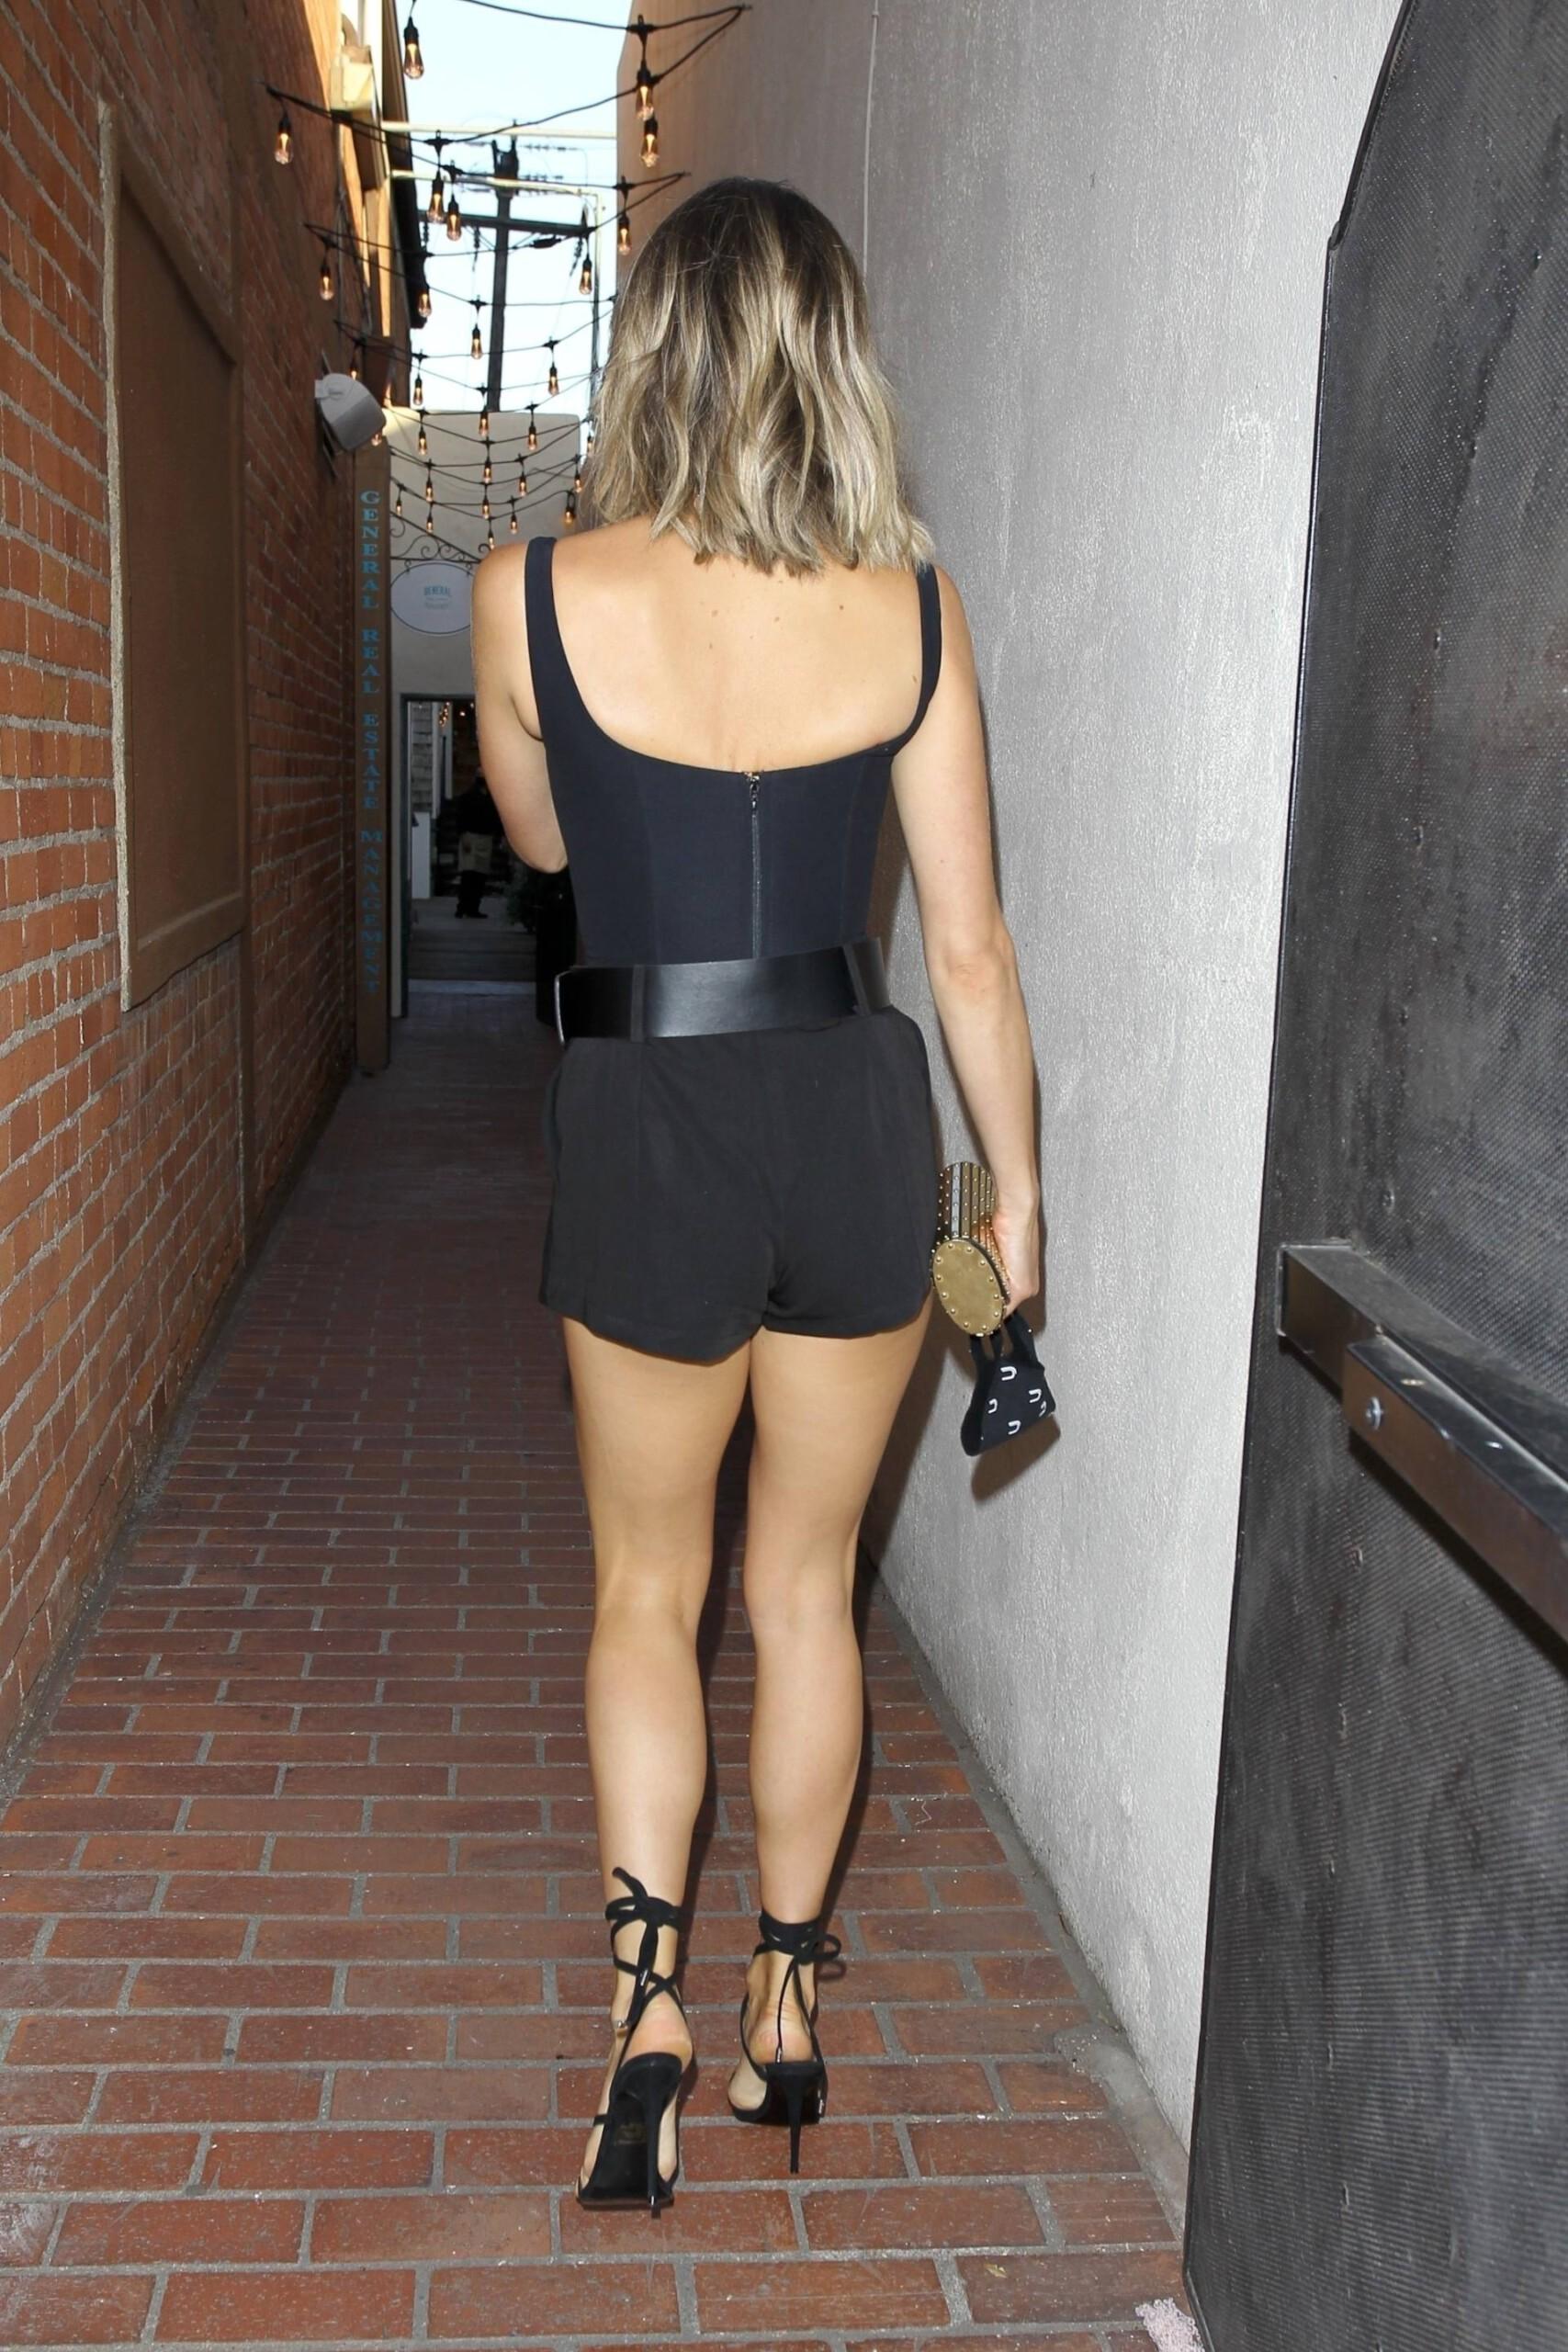 Kristin Cavallari Leggy And Busty | Hot Celebs Home